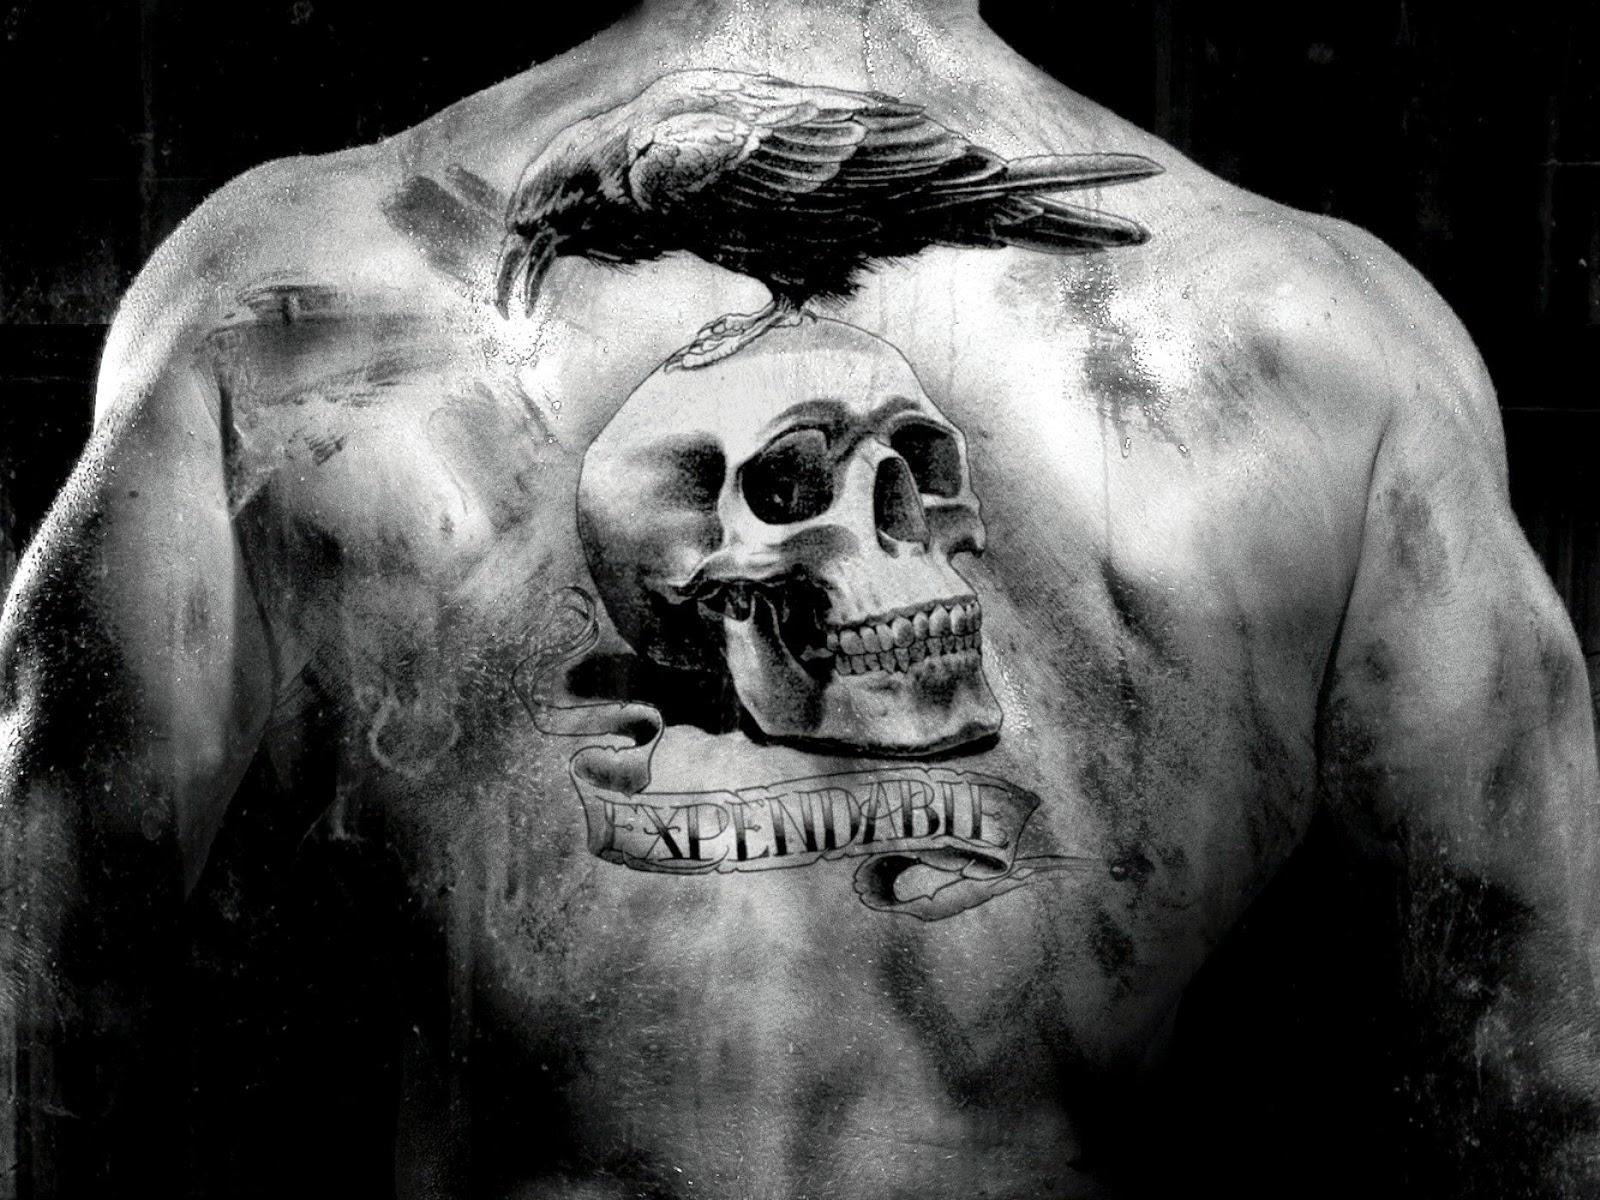 Татуировки для лесби фото 11 фотография